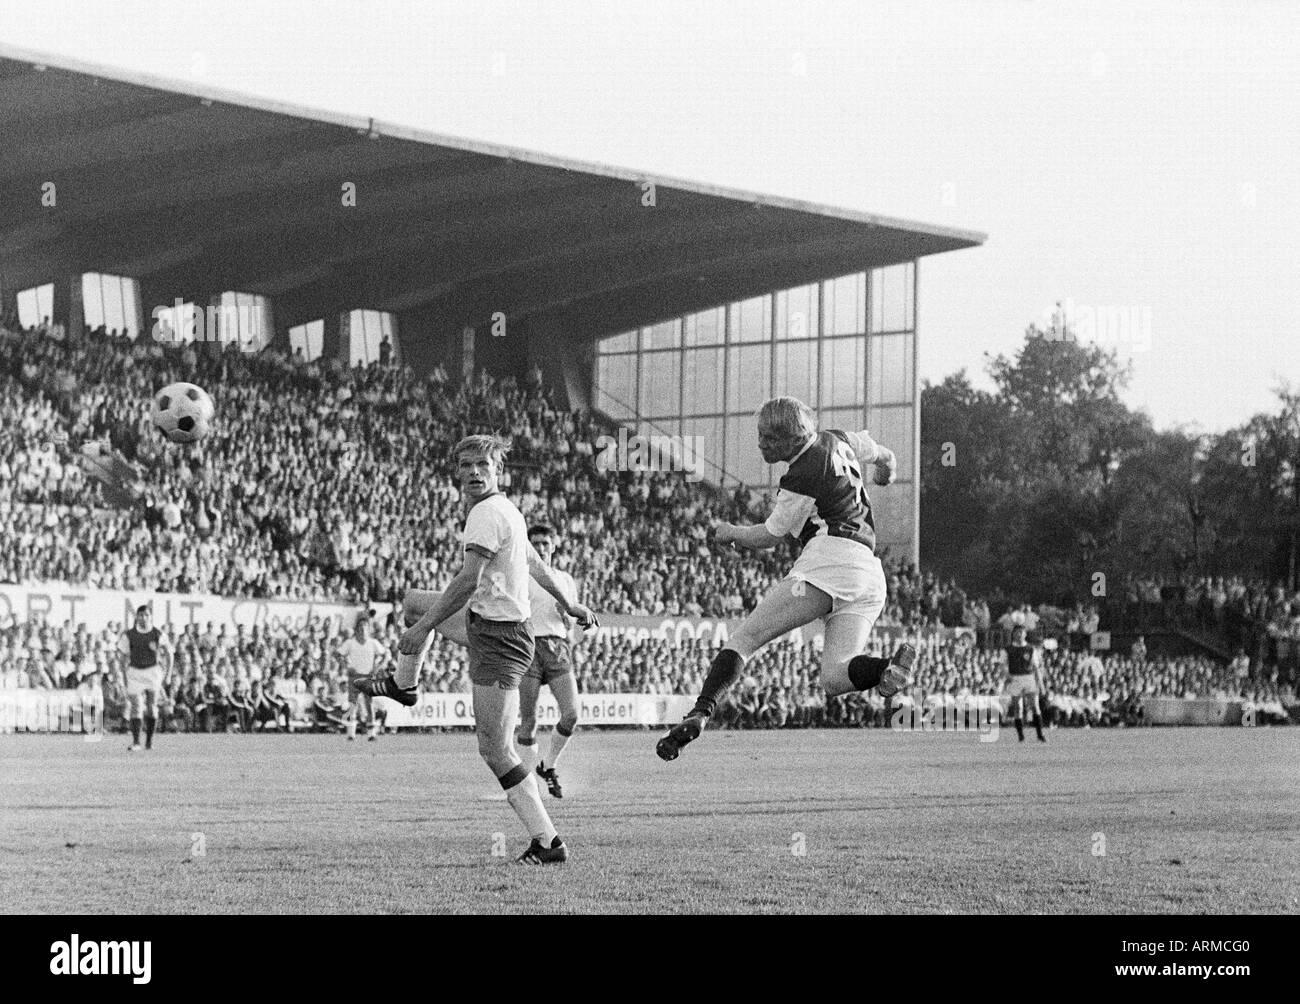 football, Regionalliga 1968/1969, promotion match to the Bundesliga 1969/1970, Rot-Weiss Essen versus Tasmania 1900 Stock Photo